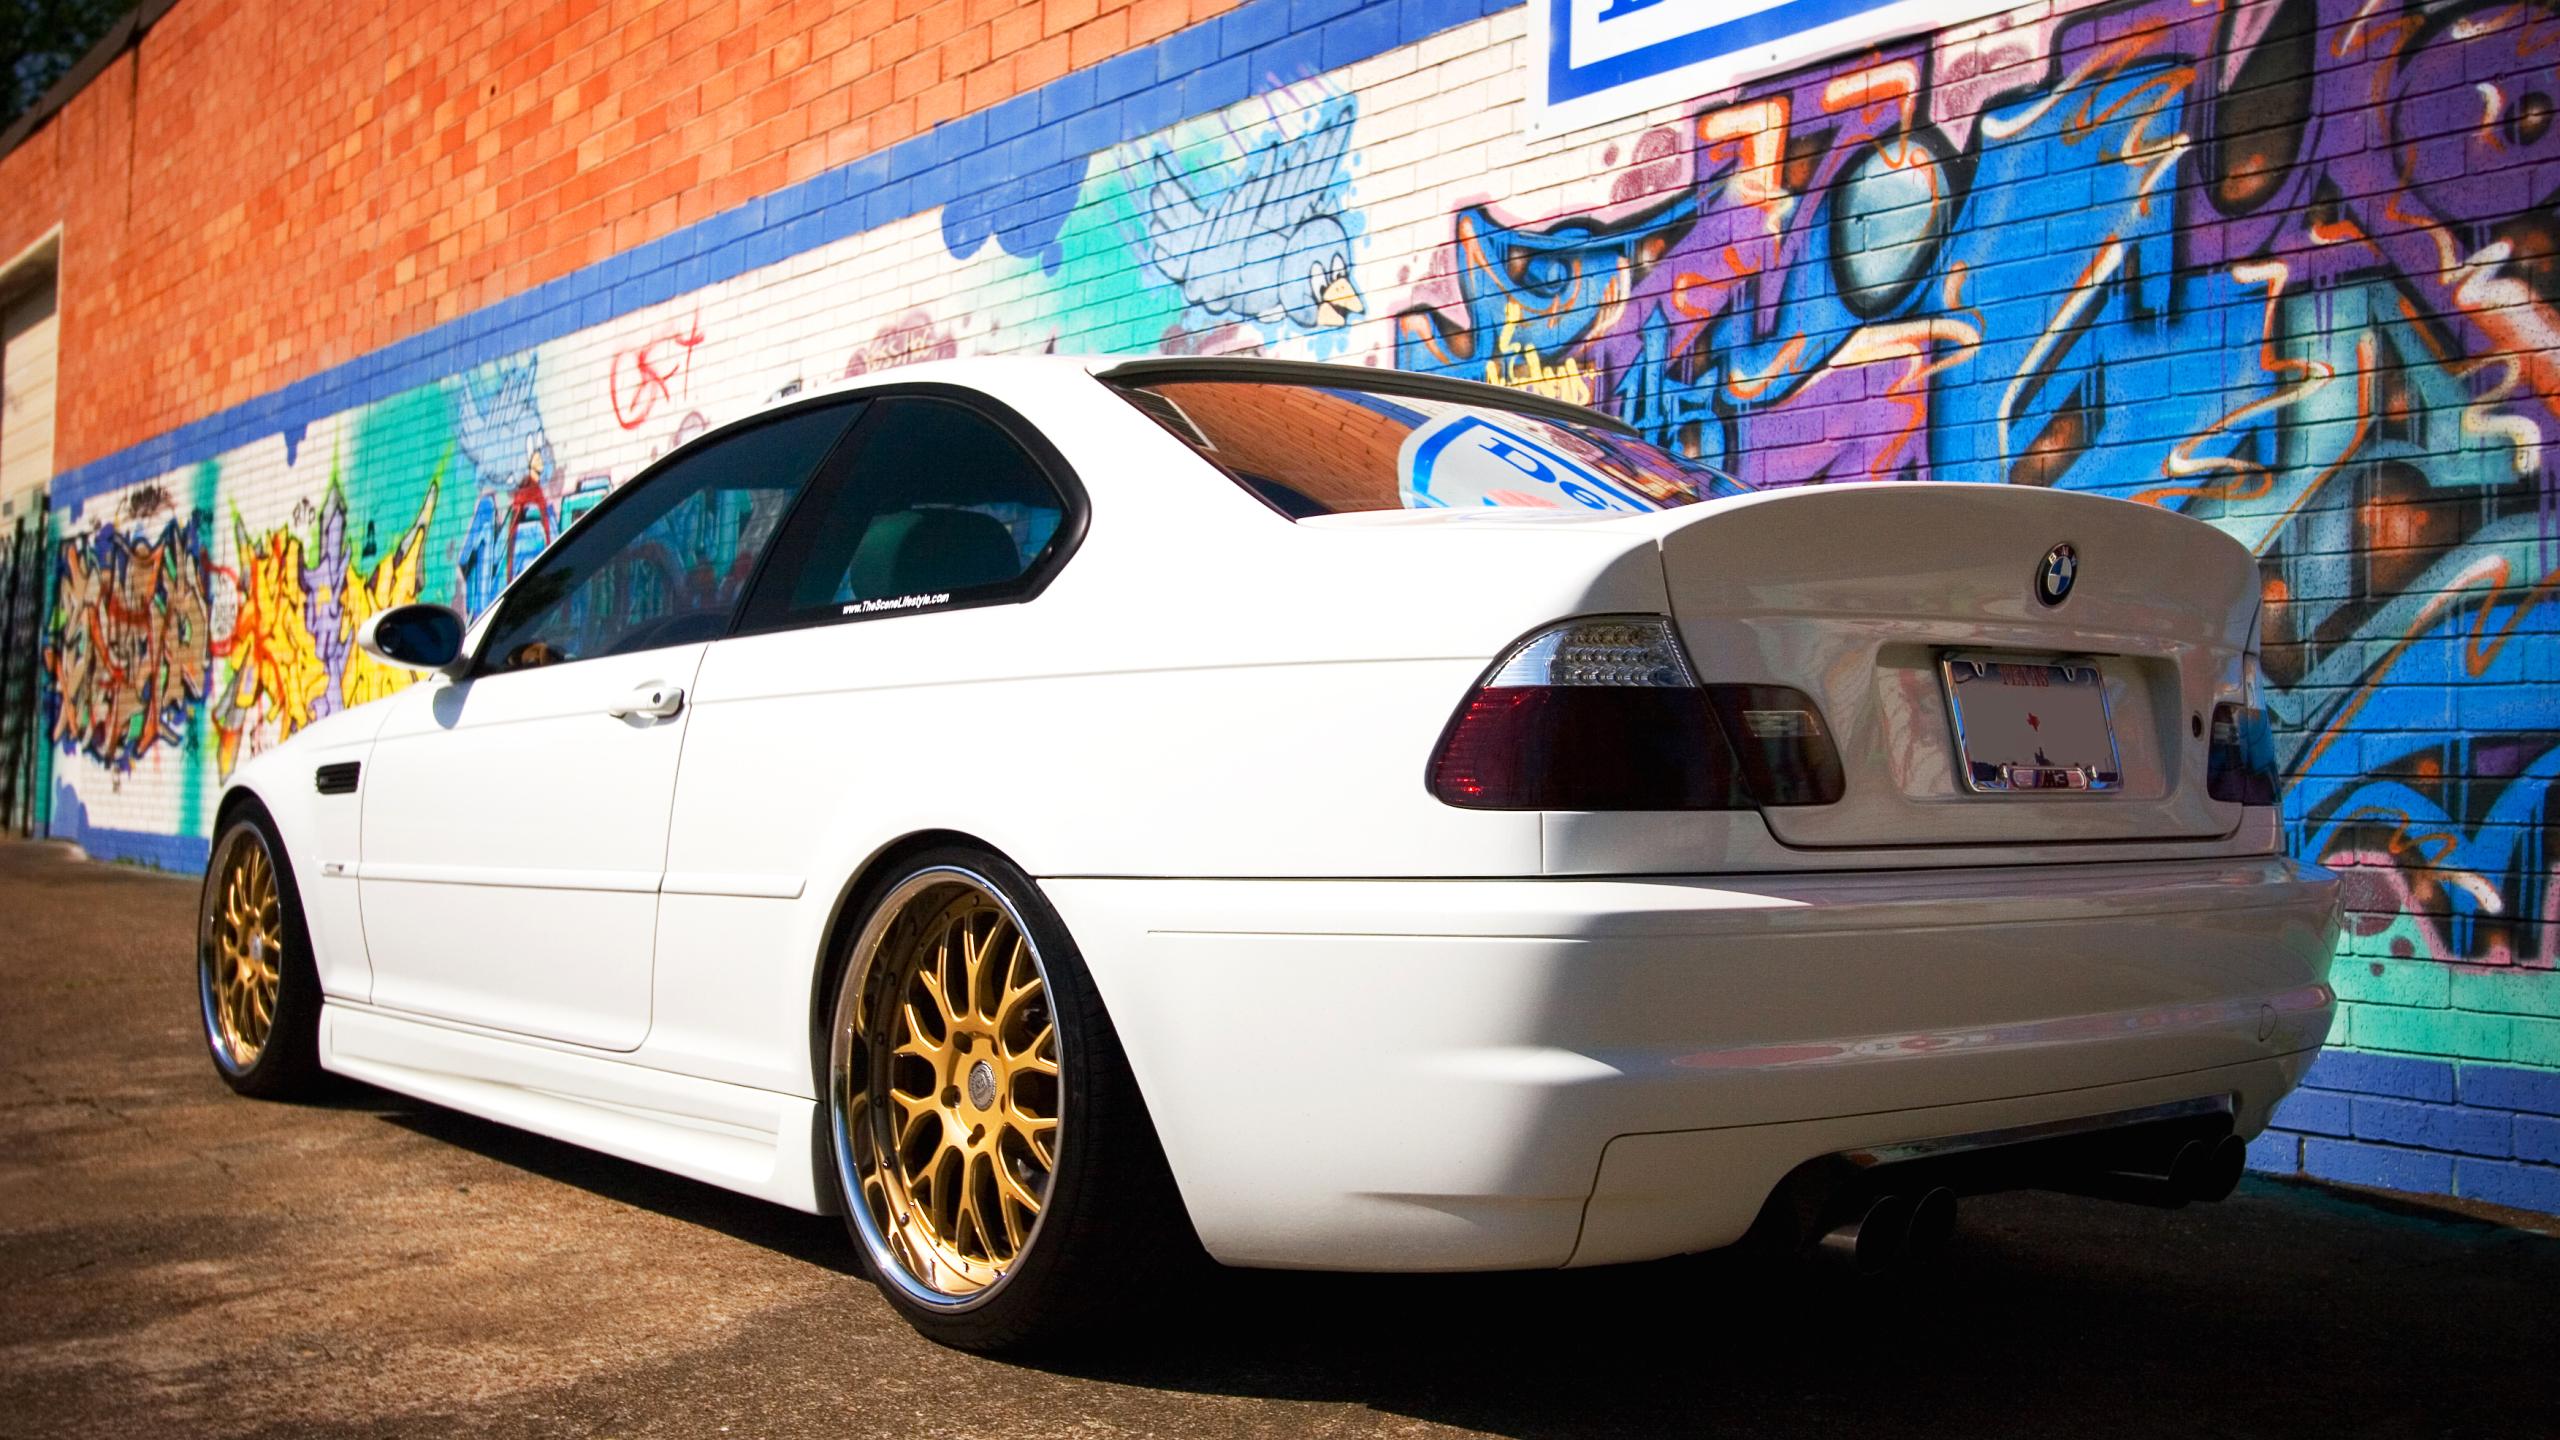 2560x1440 bmw, m3, e46 1440P Resolution Wallpaper, HD Cars ...